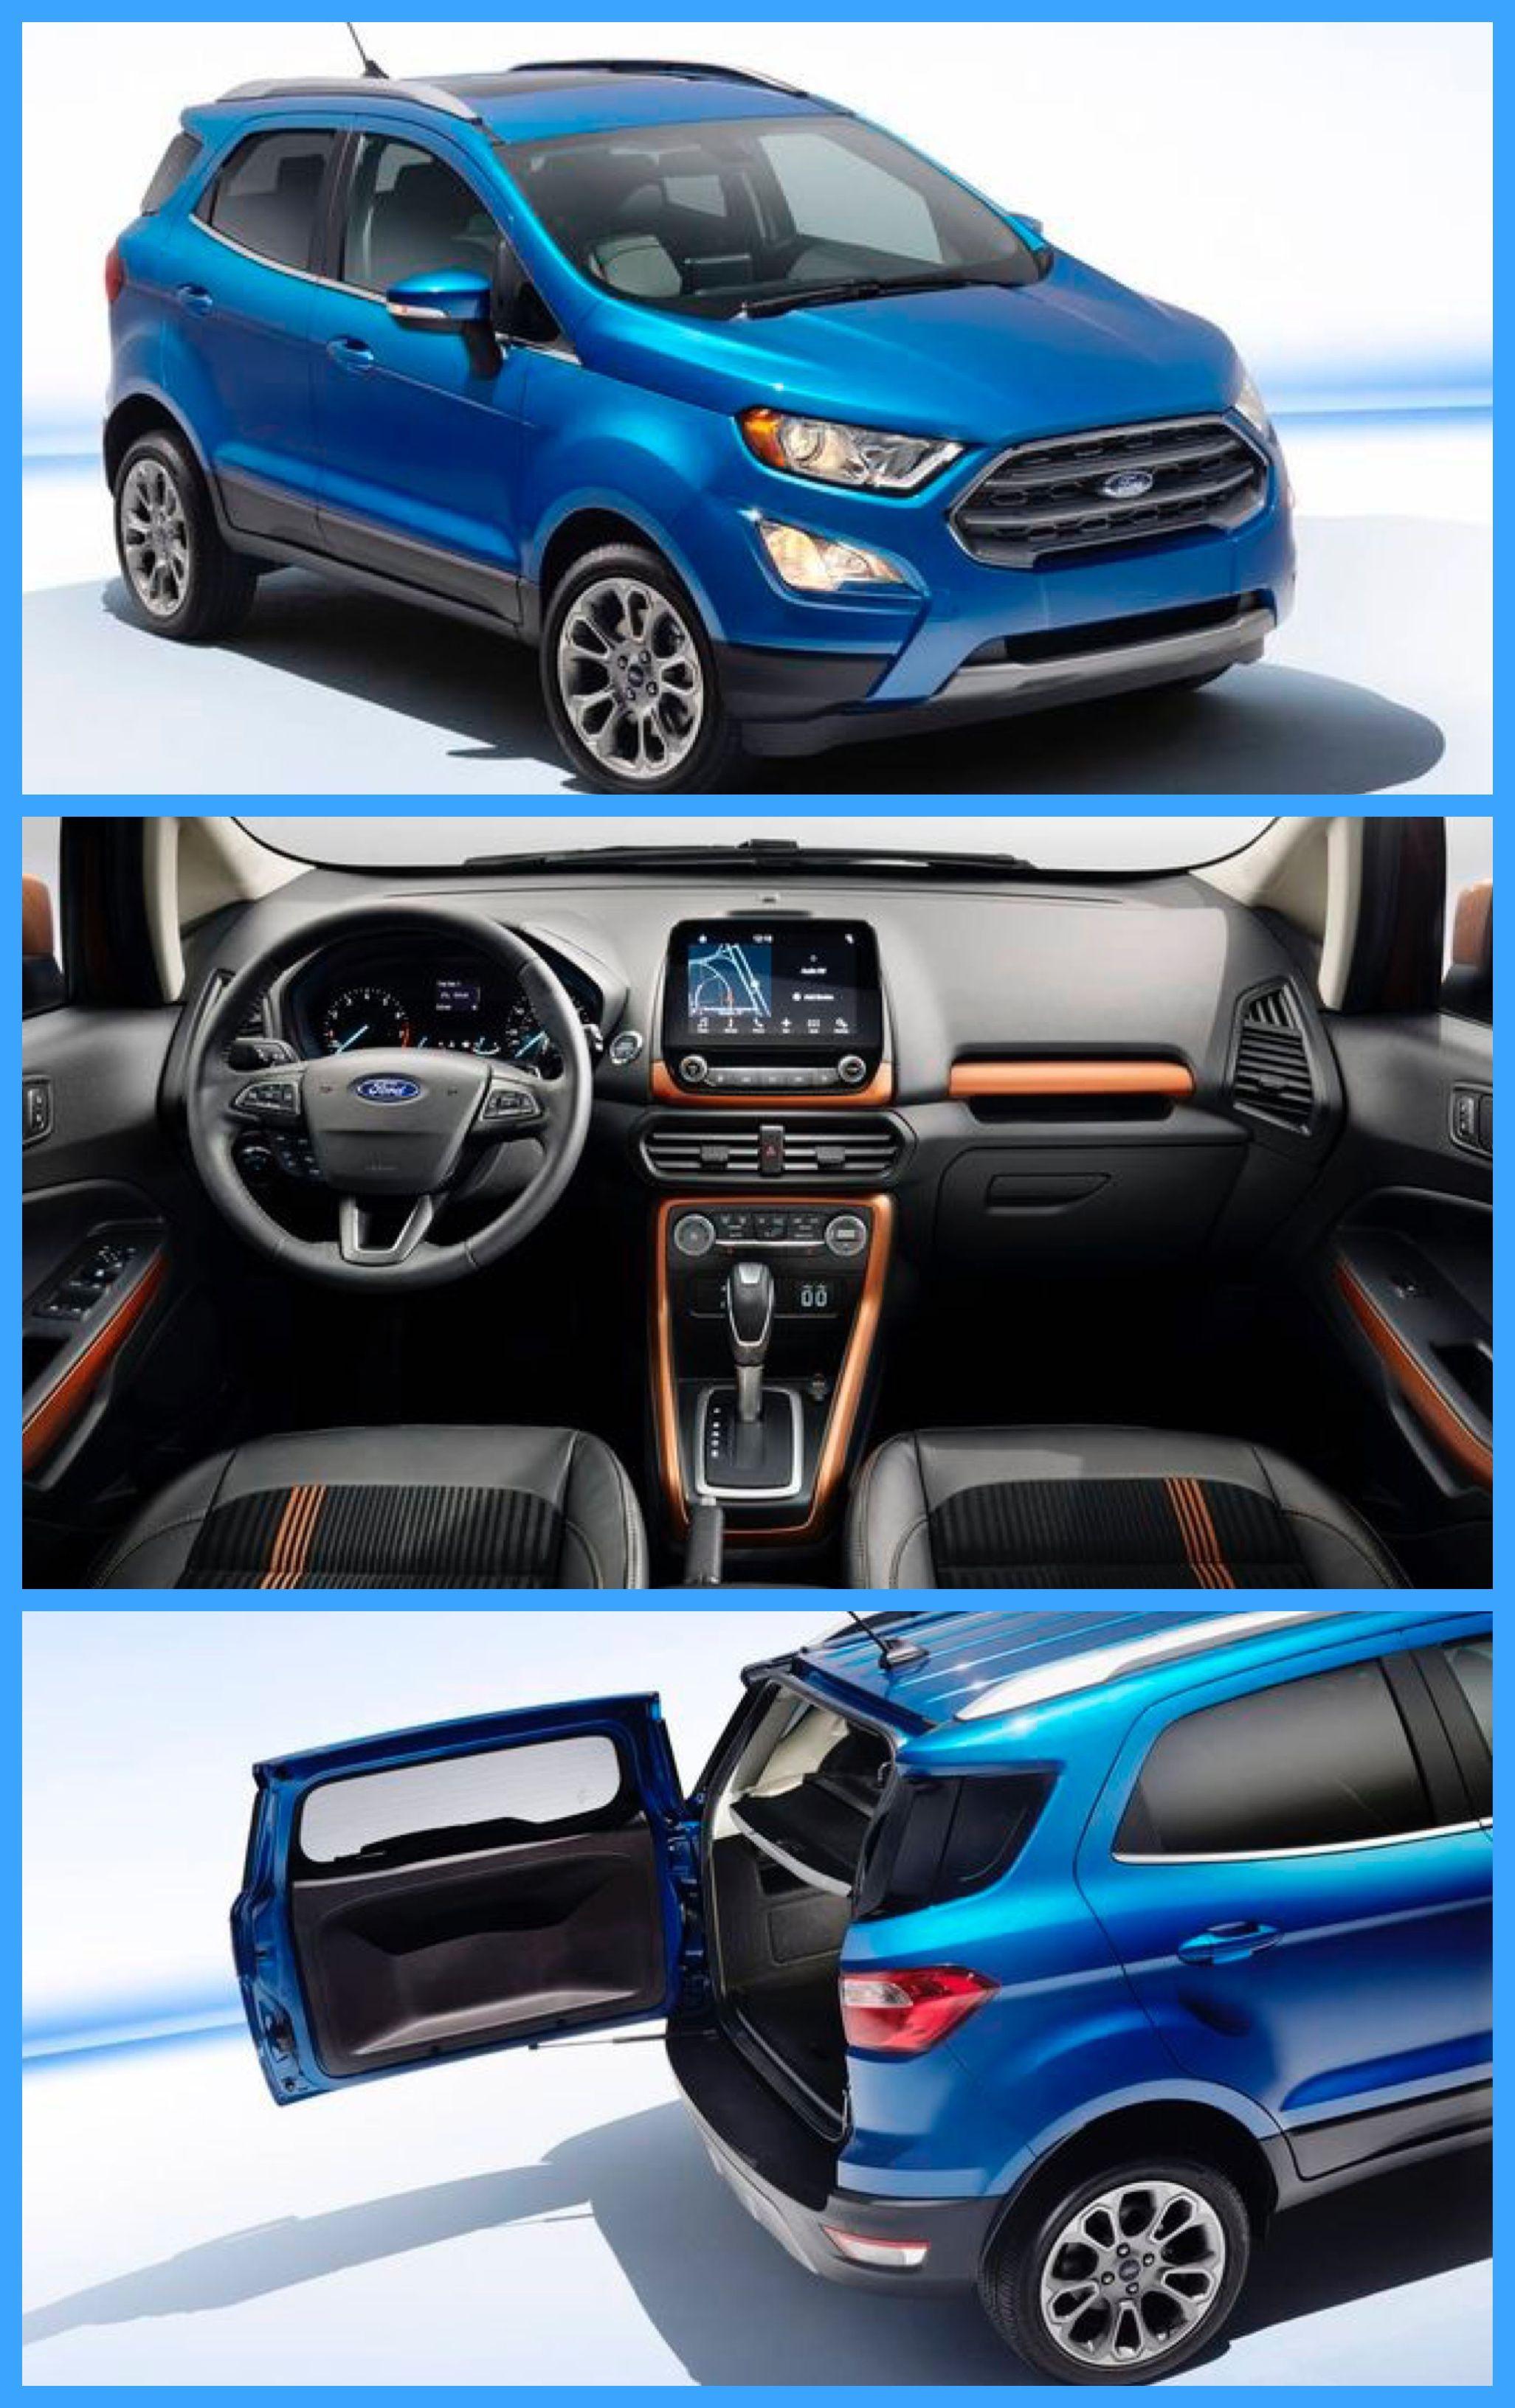 Ford Ecosport Mini Suv Suv Cars Ford Suv